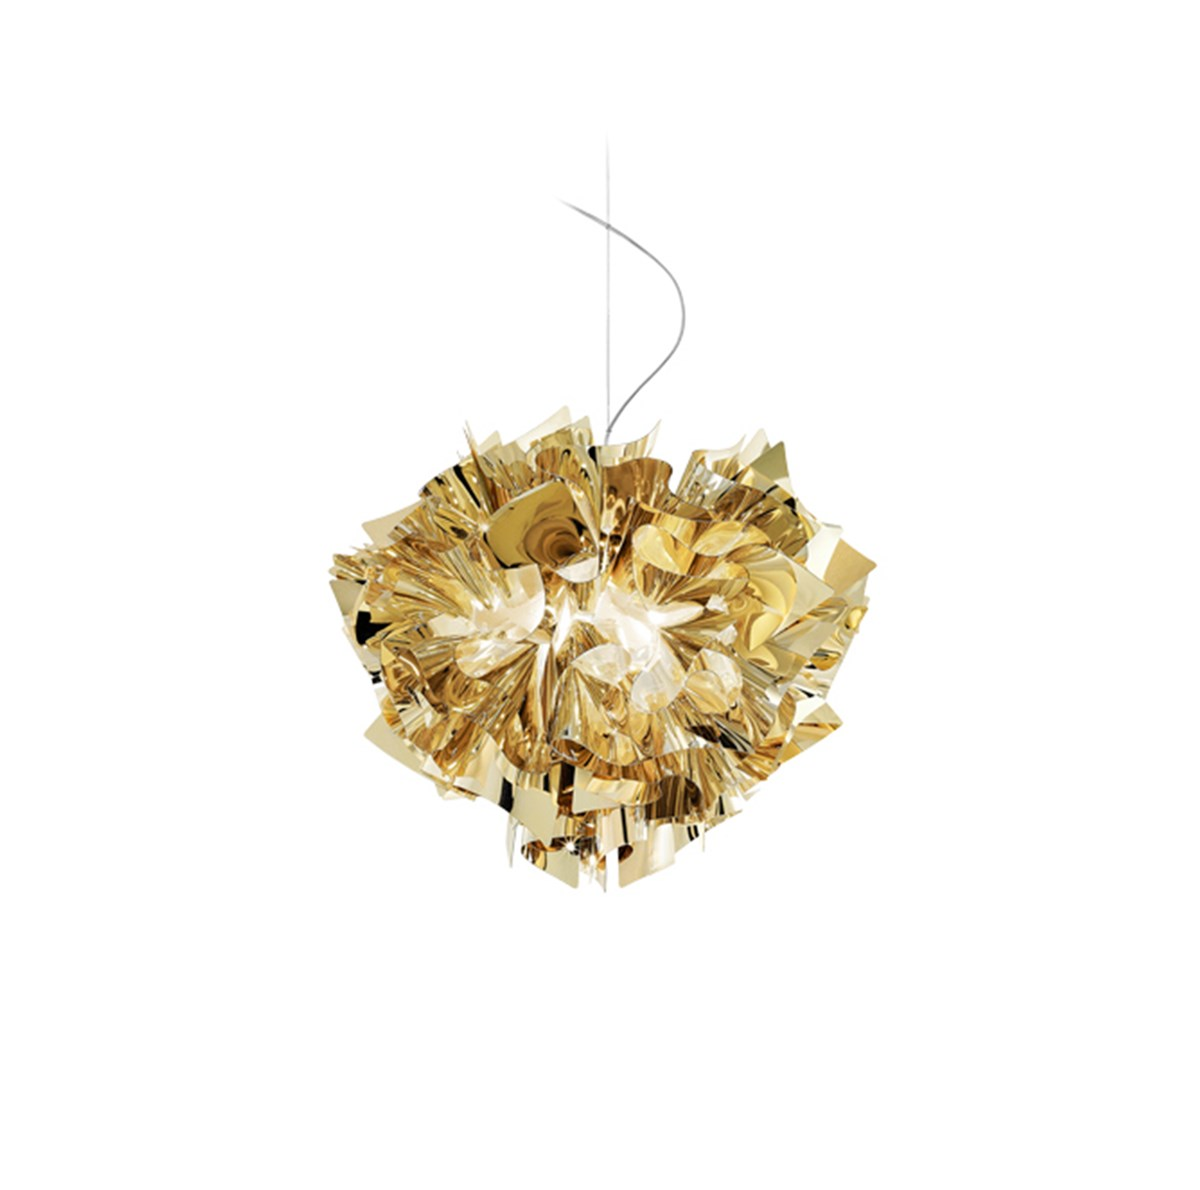 Slamp-Adriano-Rachele-Veli-Pendant-Light-Matisse-1 (1)